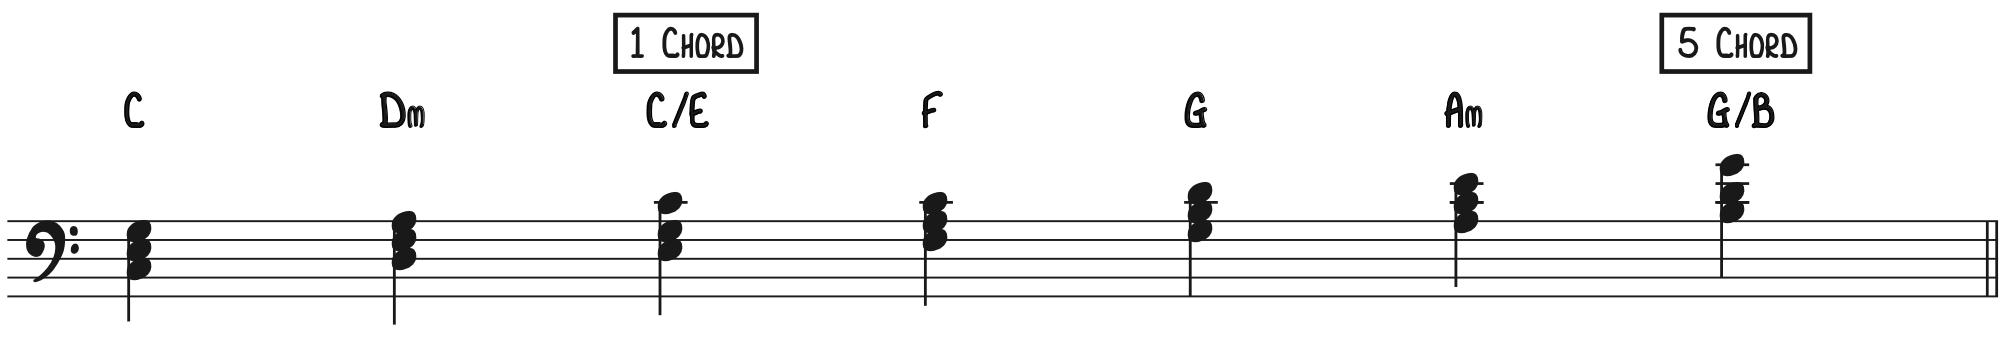 Modified Chord Progression